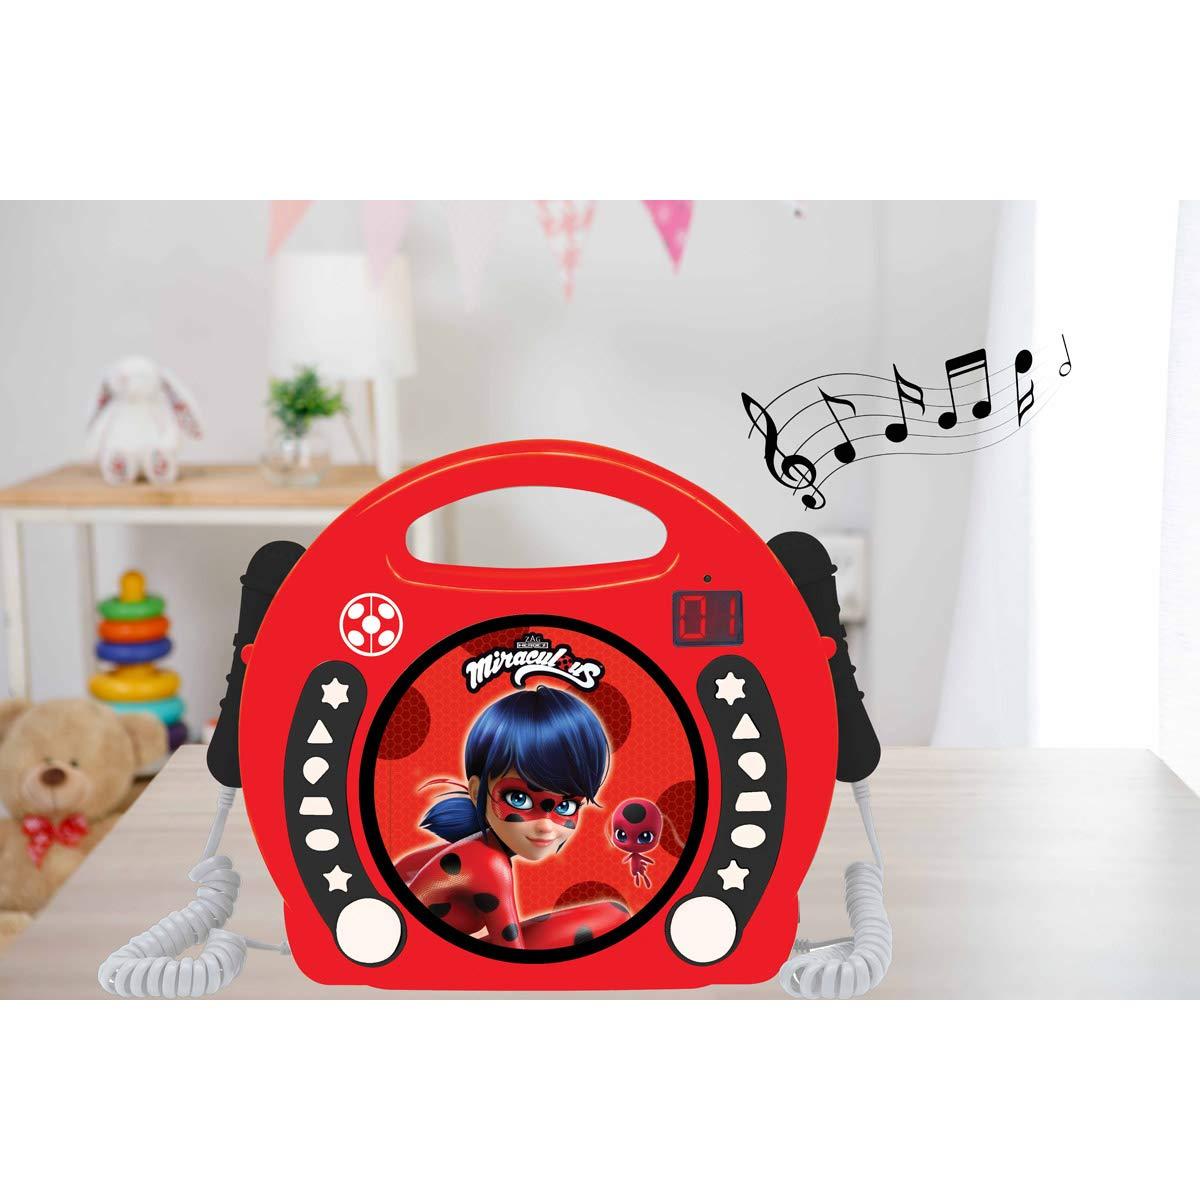 LEXiBOOK Miraculous Ladybug Radio CD, Programming Function, Headphones Jack, for Kids, with Power Supply or Batteries, Red/Black, RCDK100MI by LEXiBOOK (Image #4)